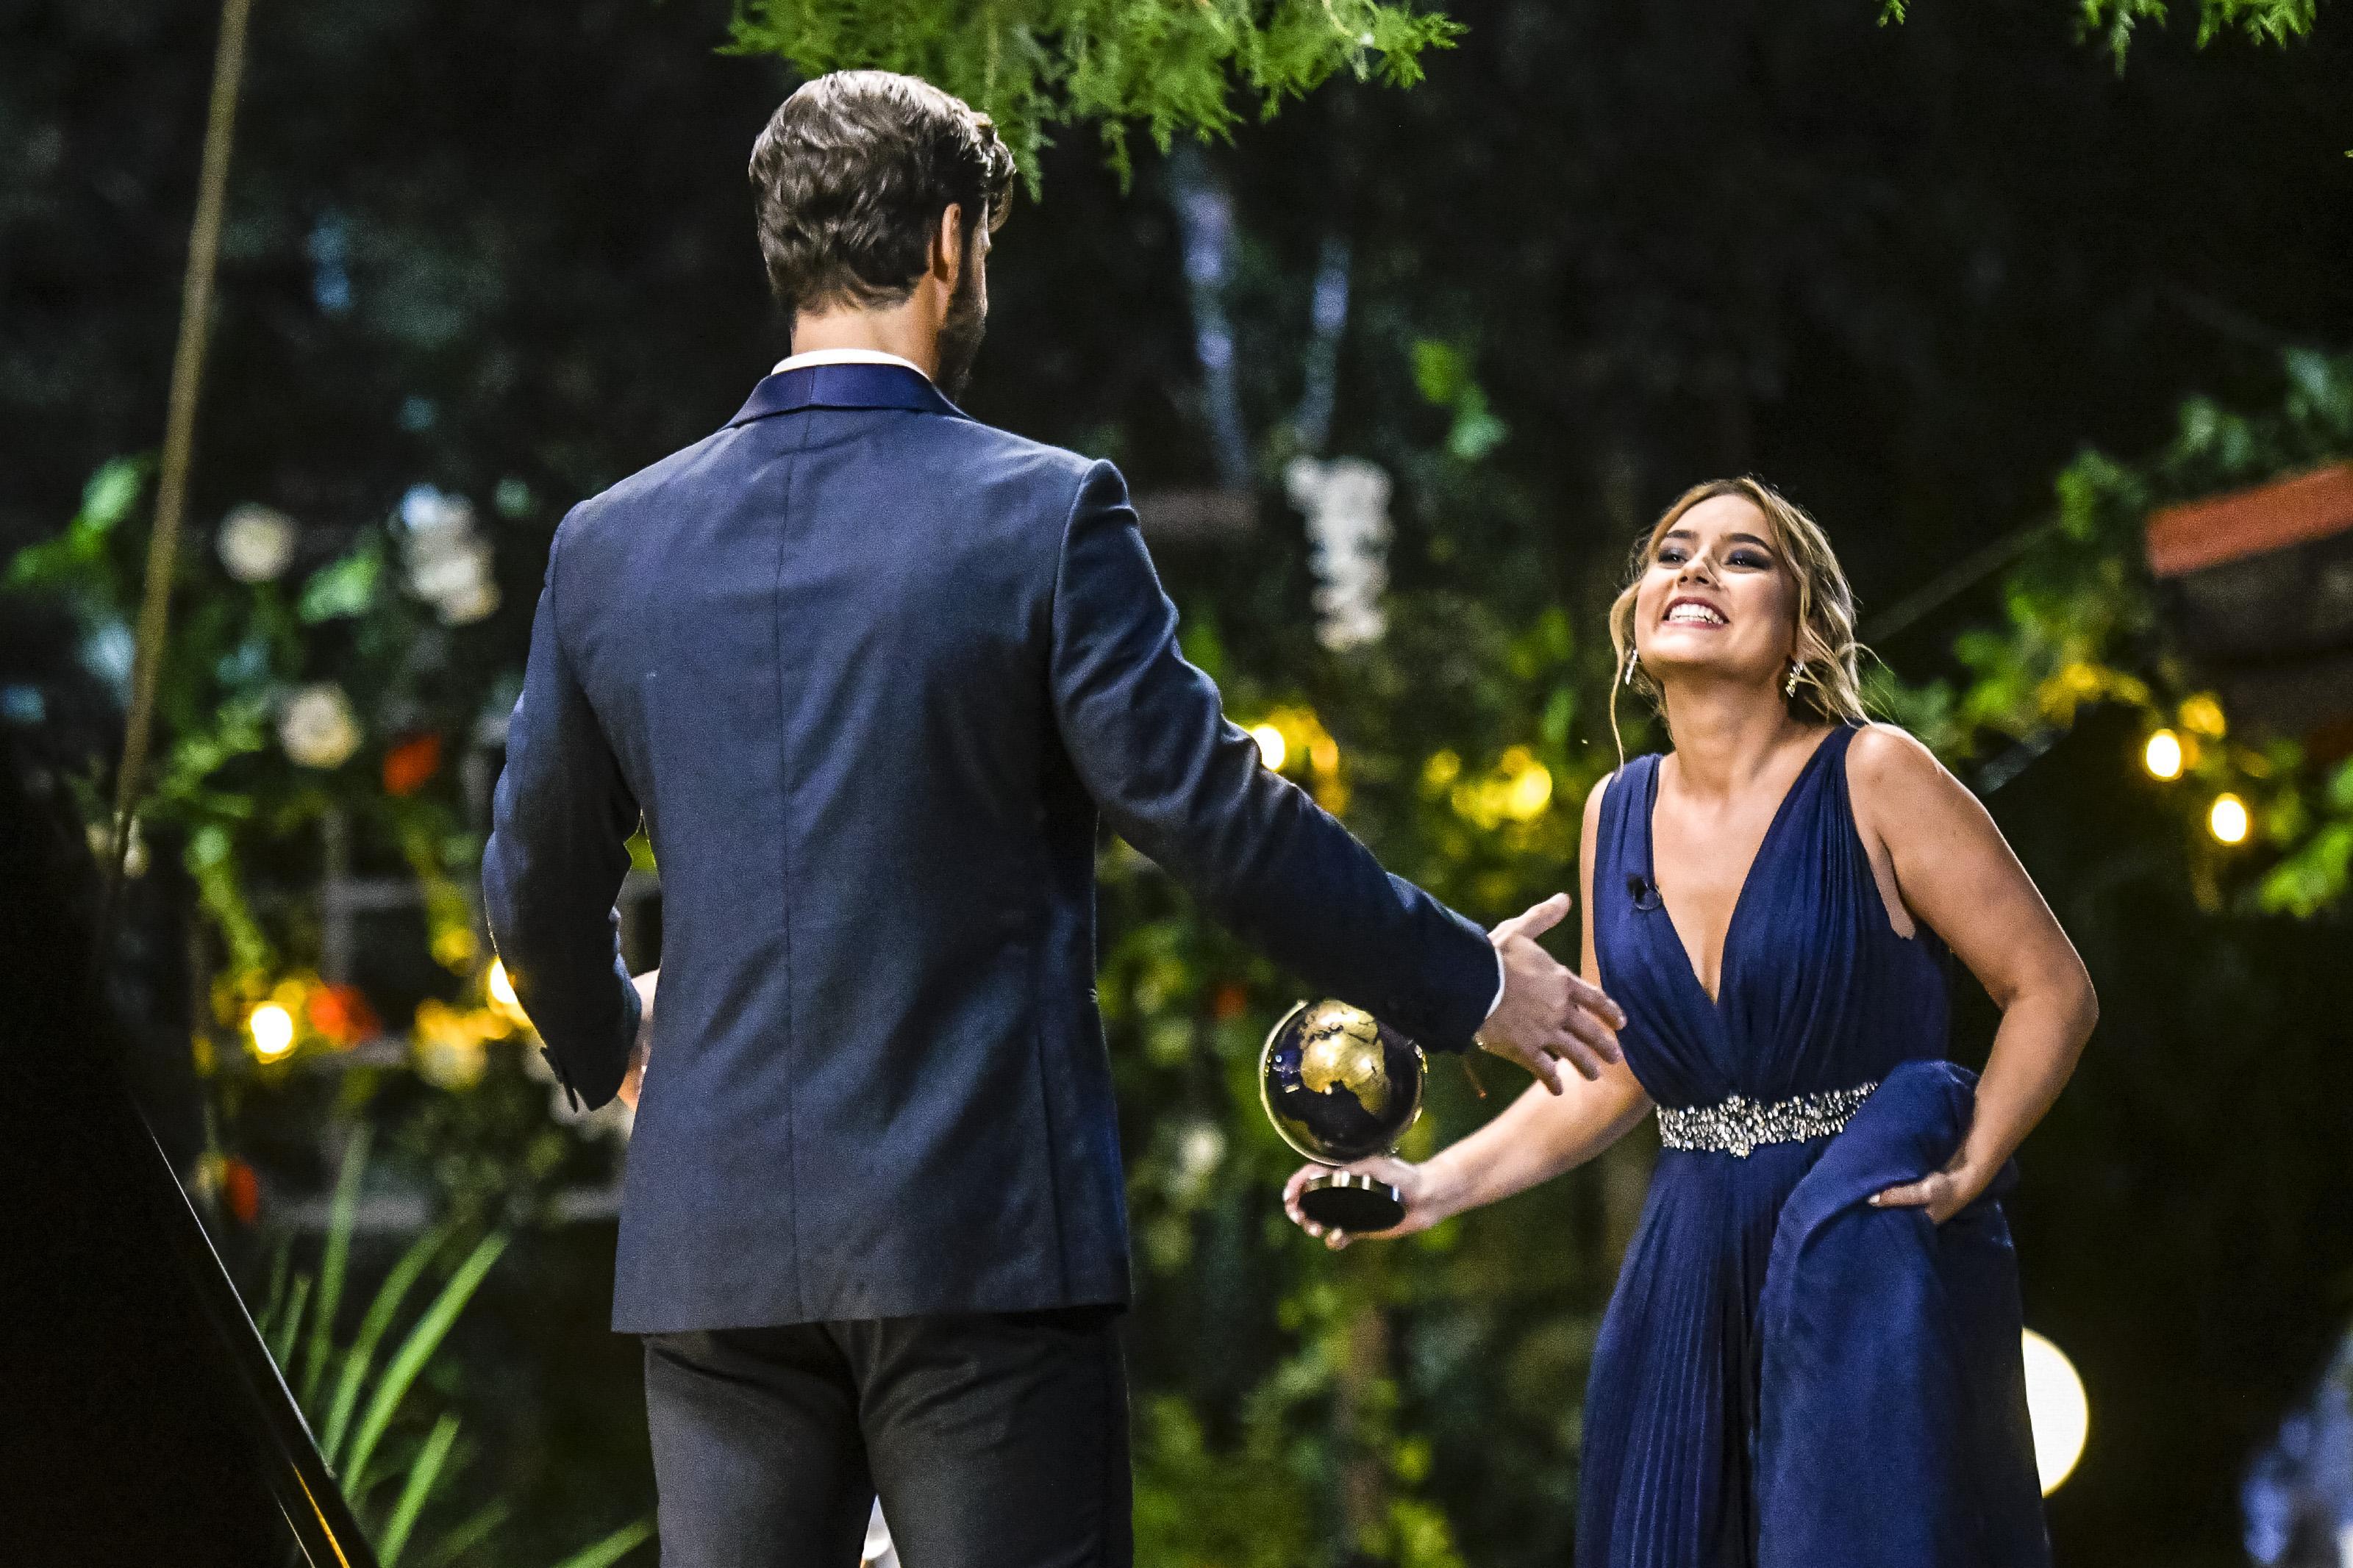 alexandra mucea imbracata intr-o rochie albastra si andi constantin cu spatele